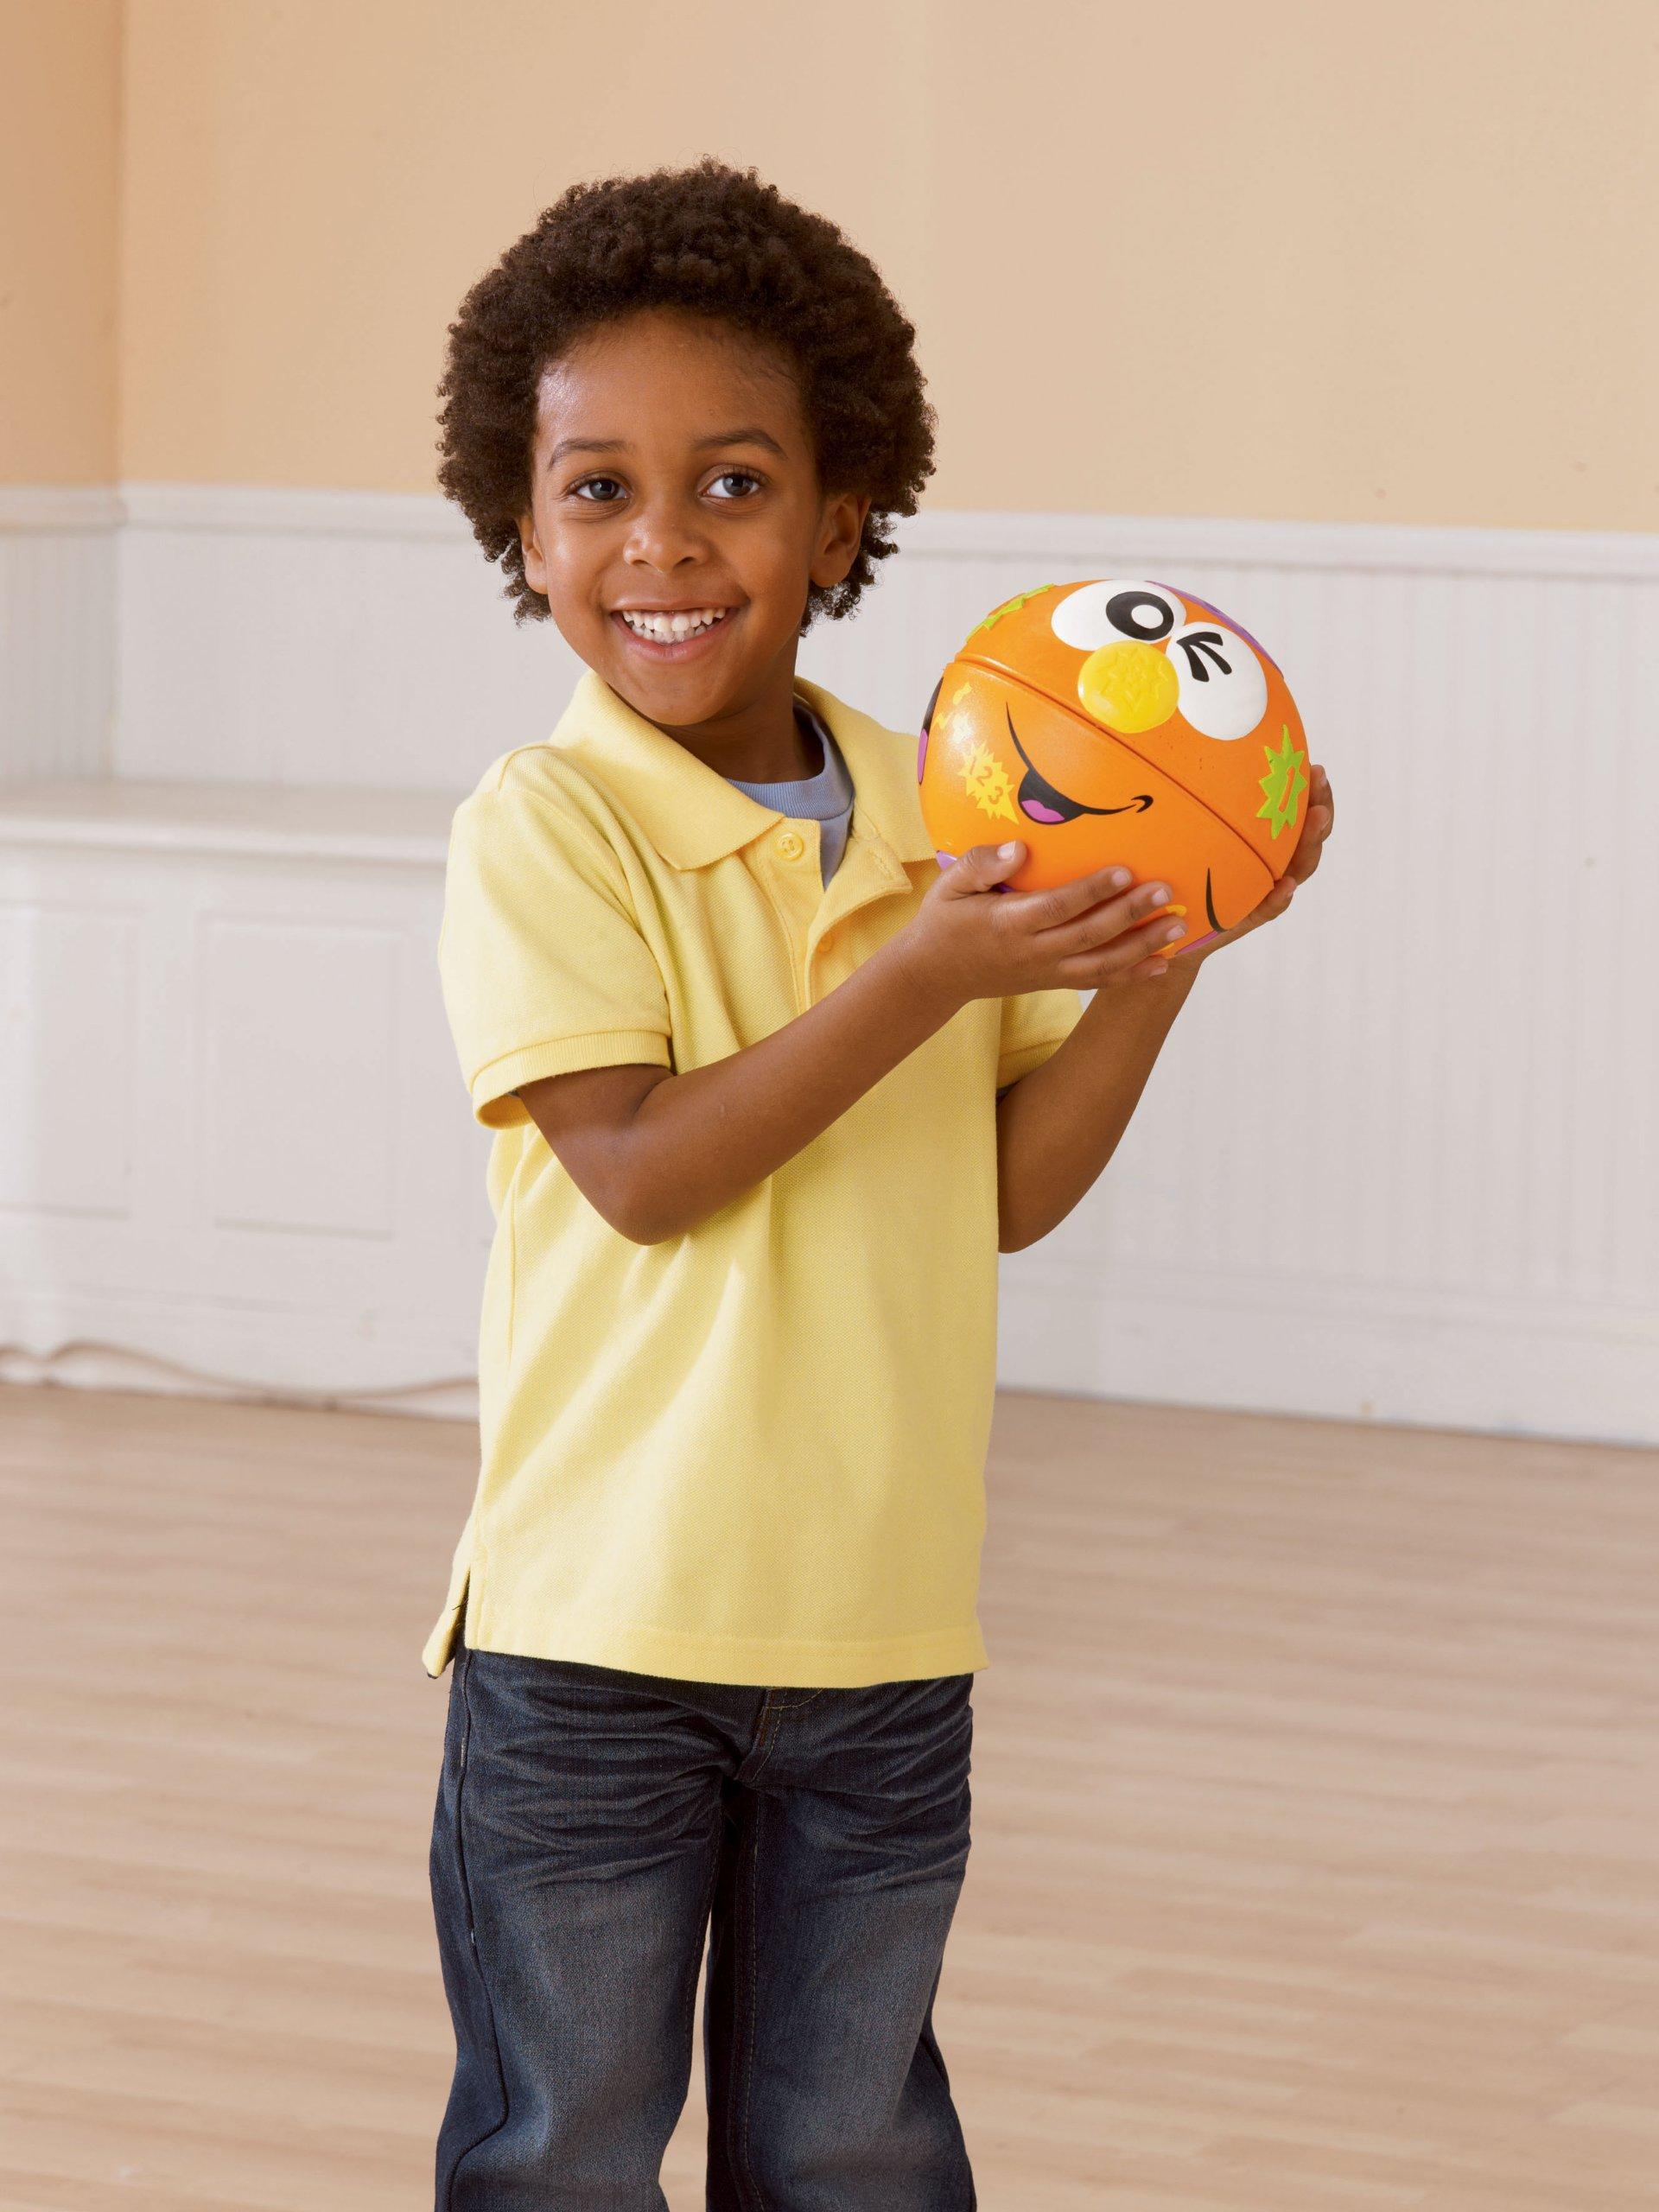 VTech Brilli The Imagination Ball - Orange by VTech (Image #2)